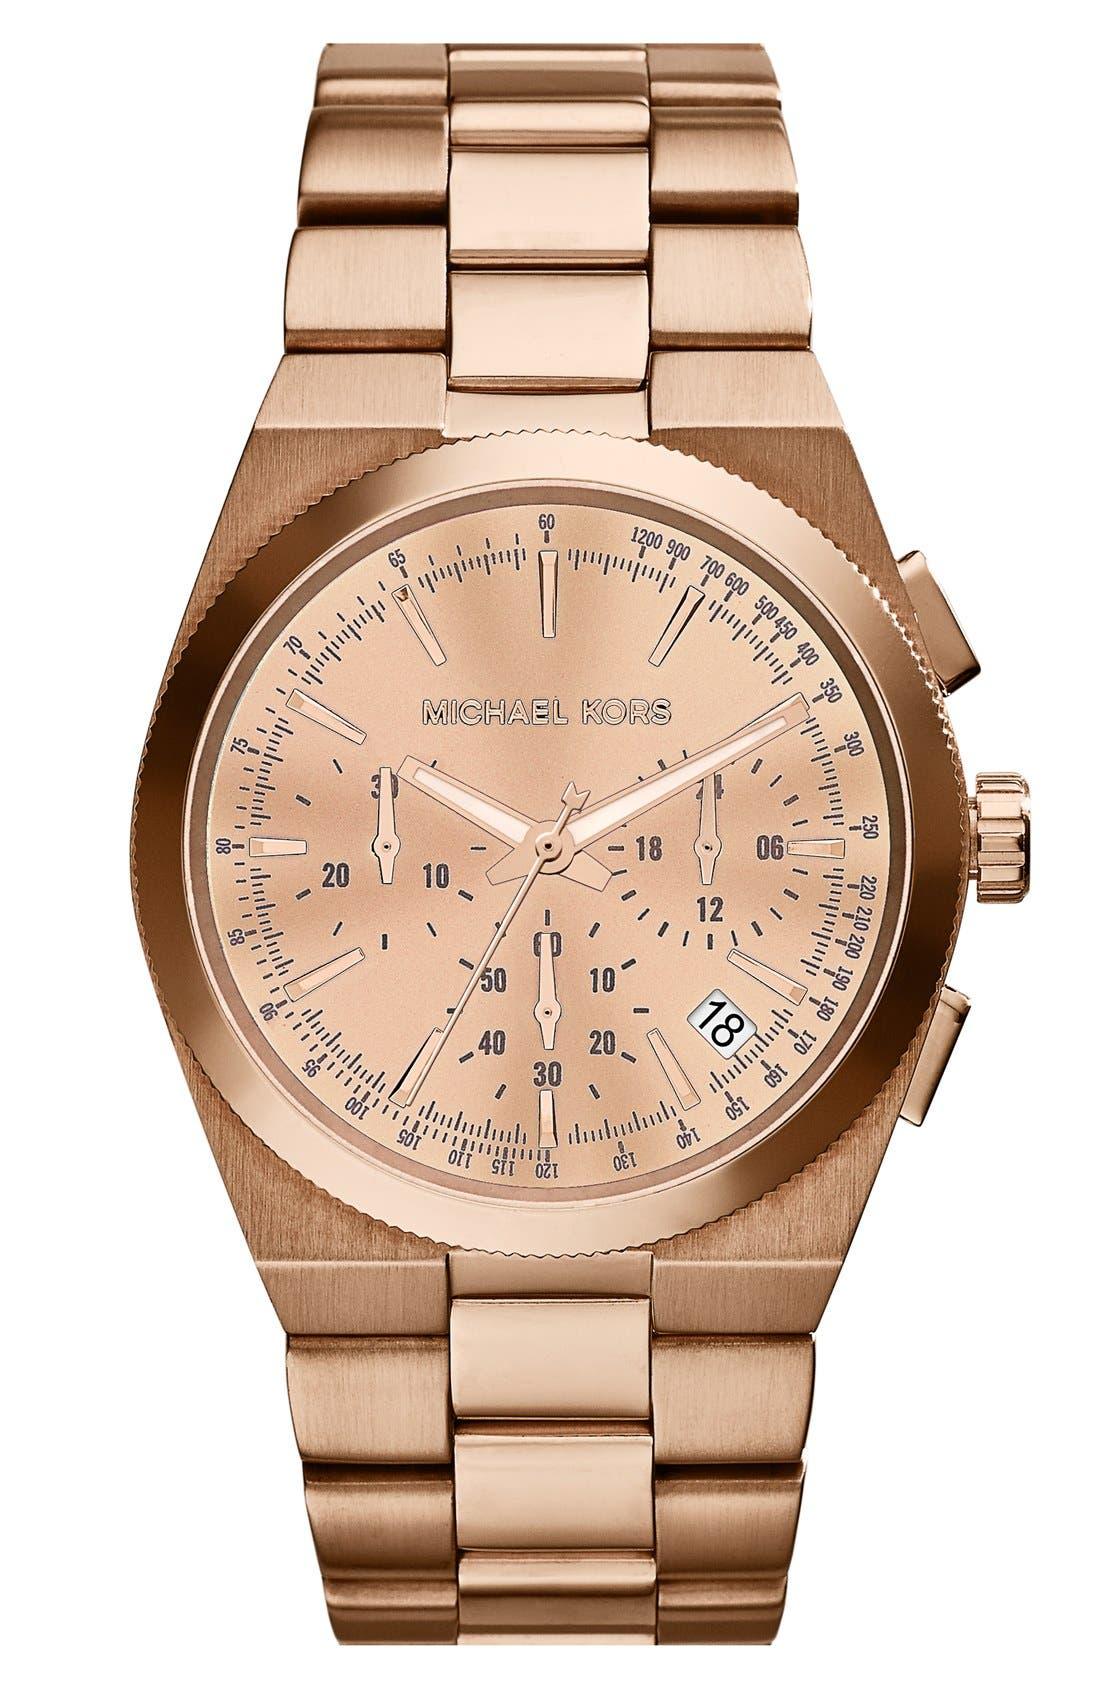 Main Image - Michael Kors 'Channing' Chronograph Bracelet Watch, 38mm